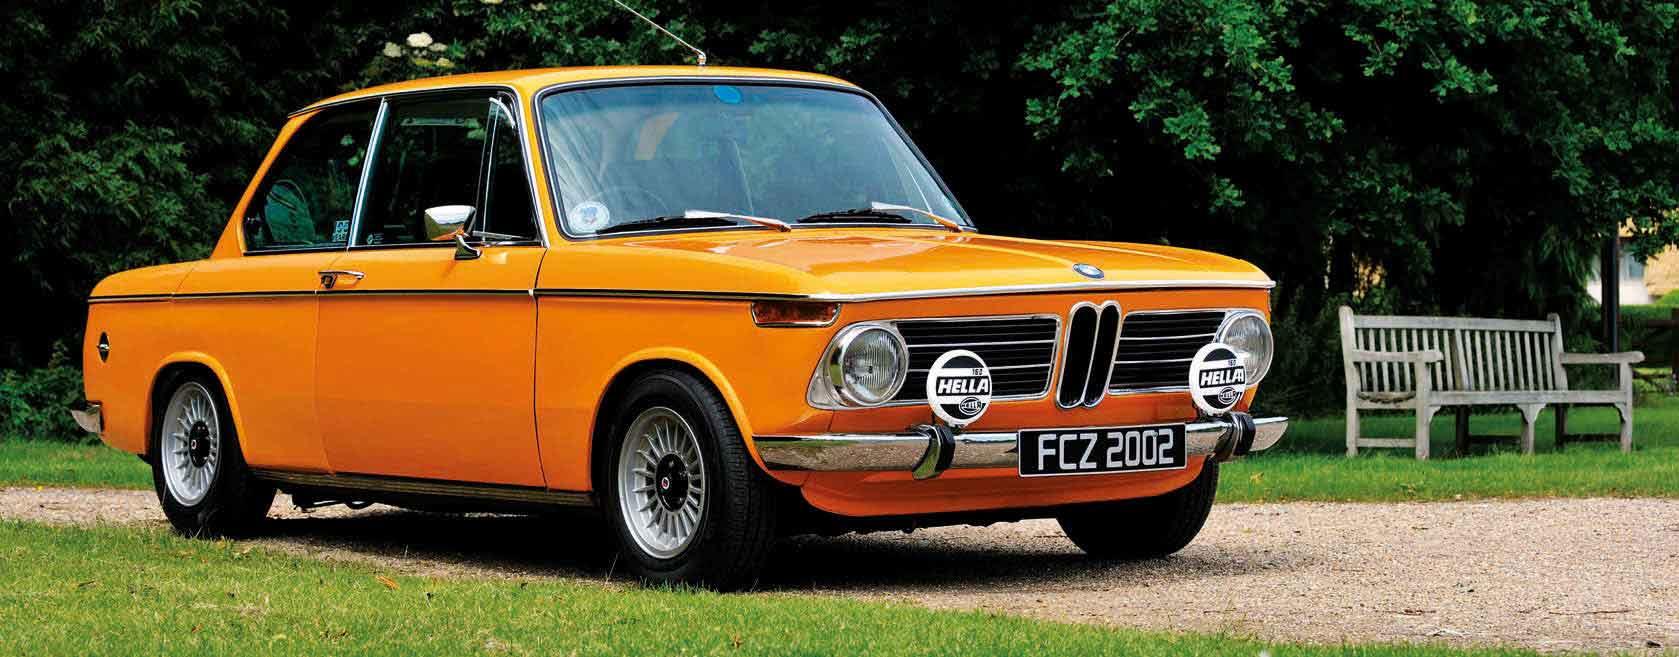 1974 Bmw 2002 Tii E10 In Garage Drive My Blogs Drive